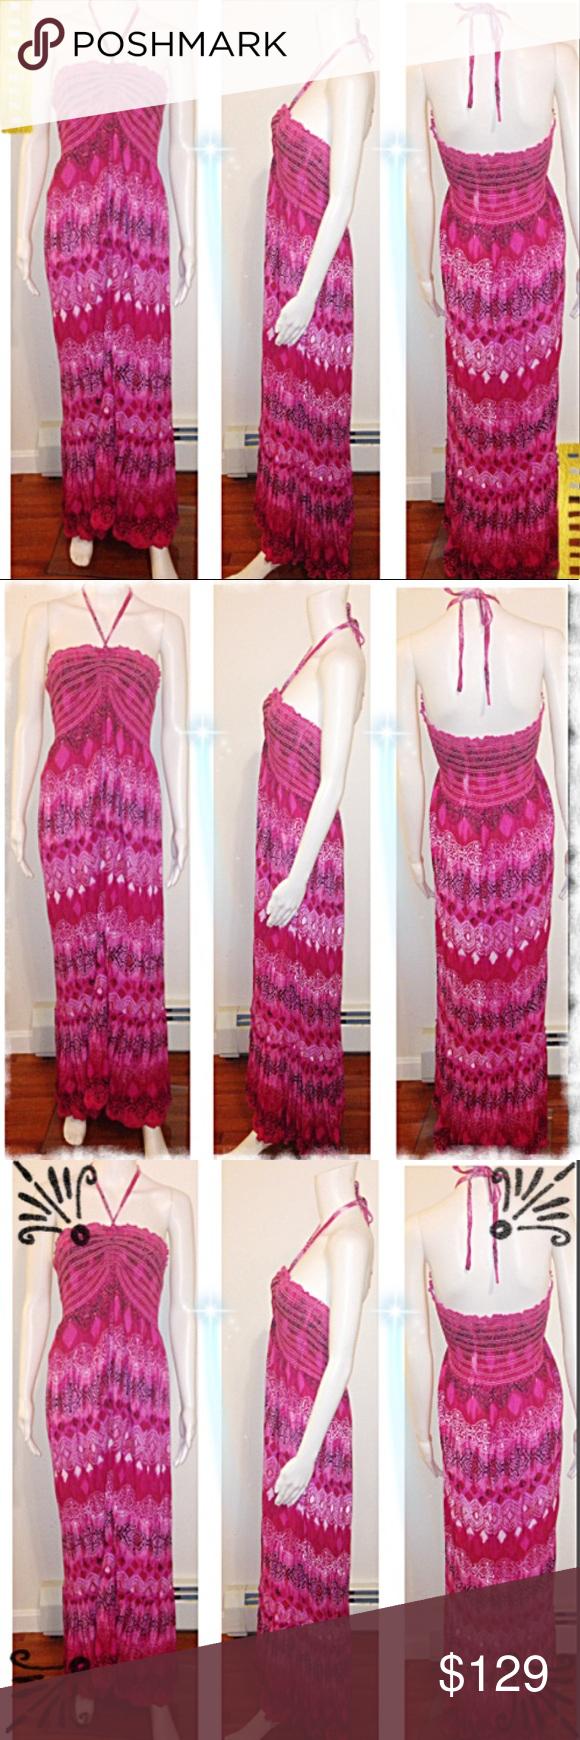 ✅Boho Halter Maxi Dress Rayon Boho Vibes Printed Colorful Maxi full ...